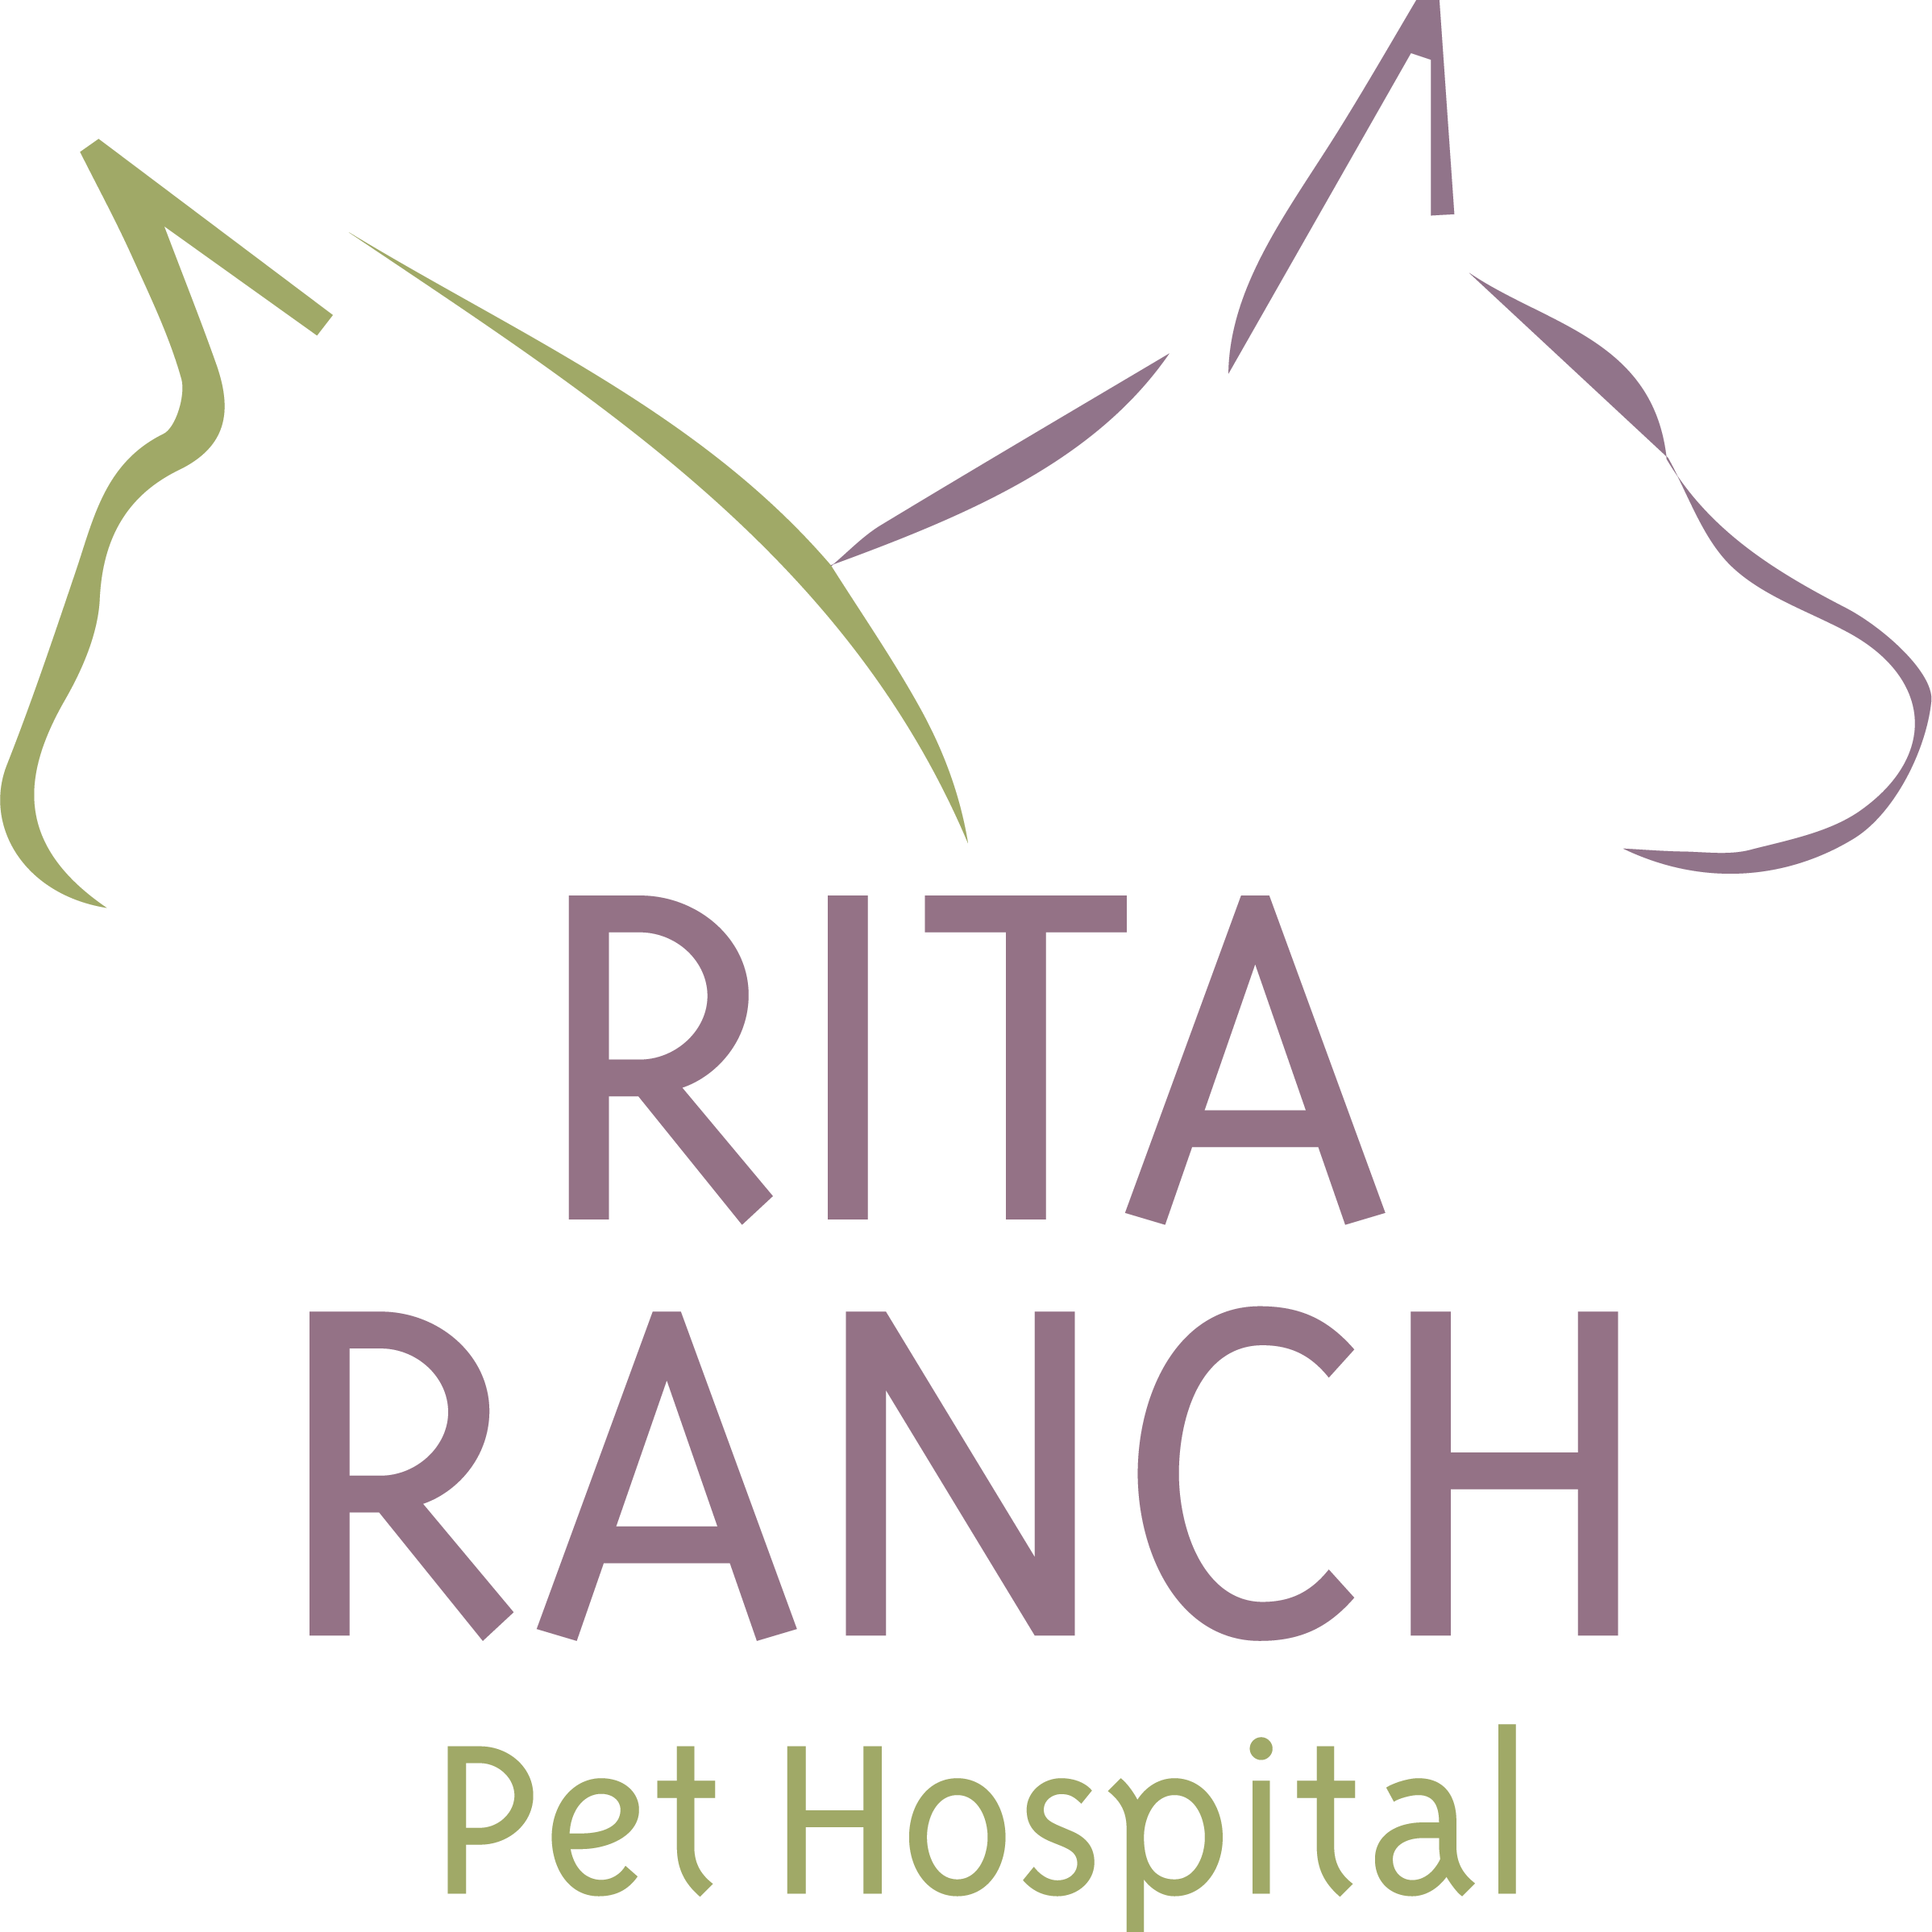 Rita Ranch Pet Hospital